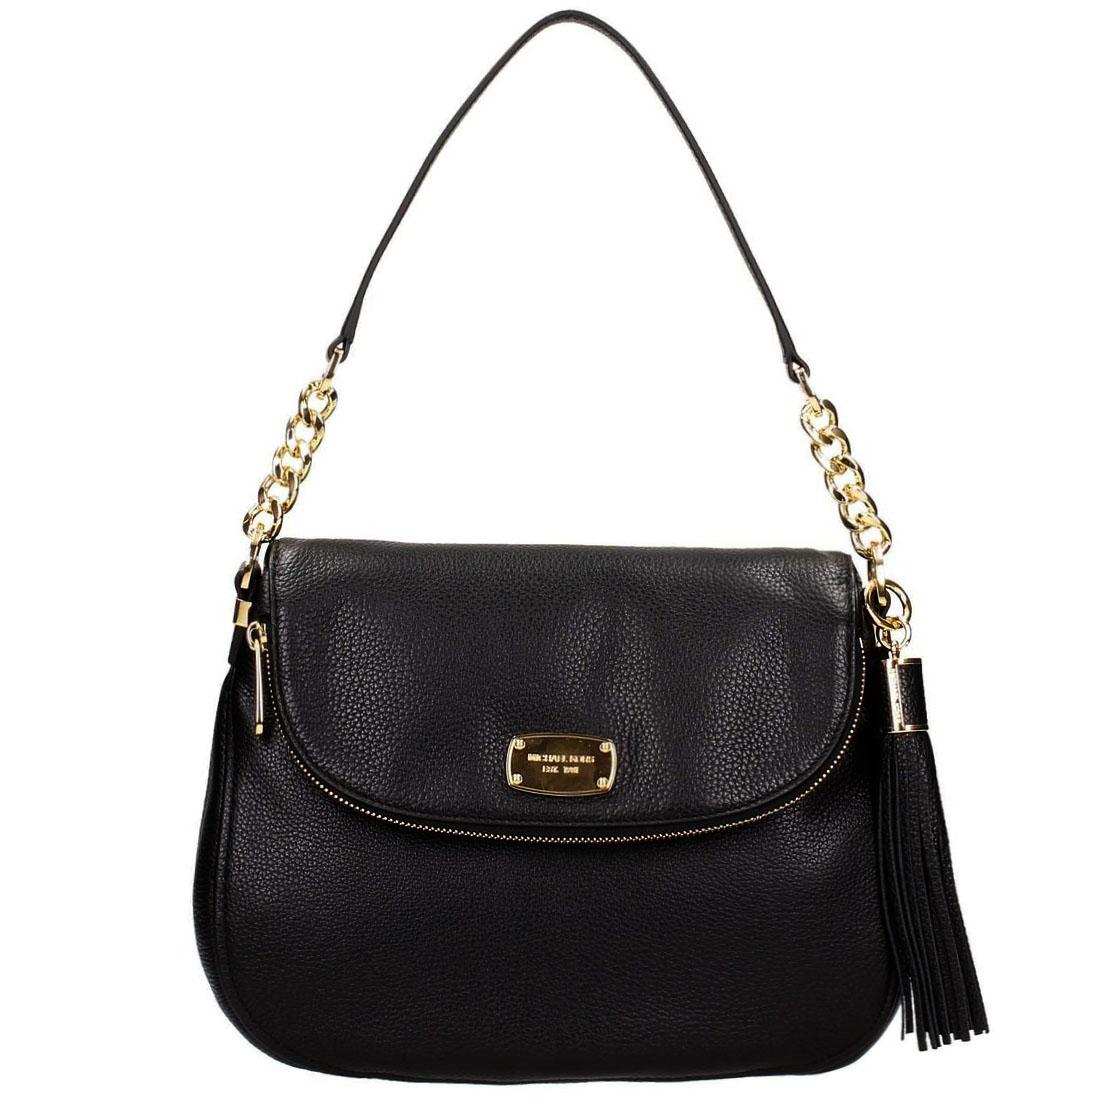 79526c14dc19 Michael Kors Bedford Medium Tassel Convertible Shoulder Bag Black #  35F5GBFL2L